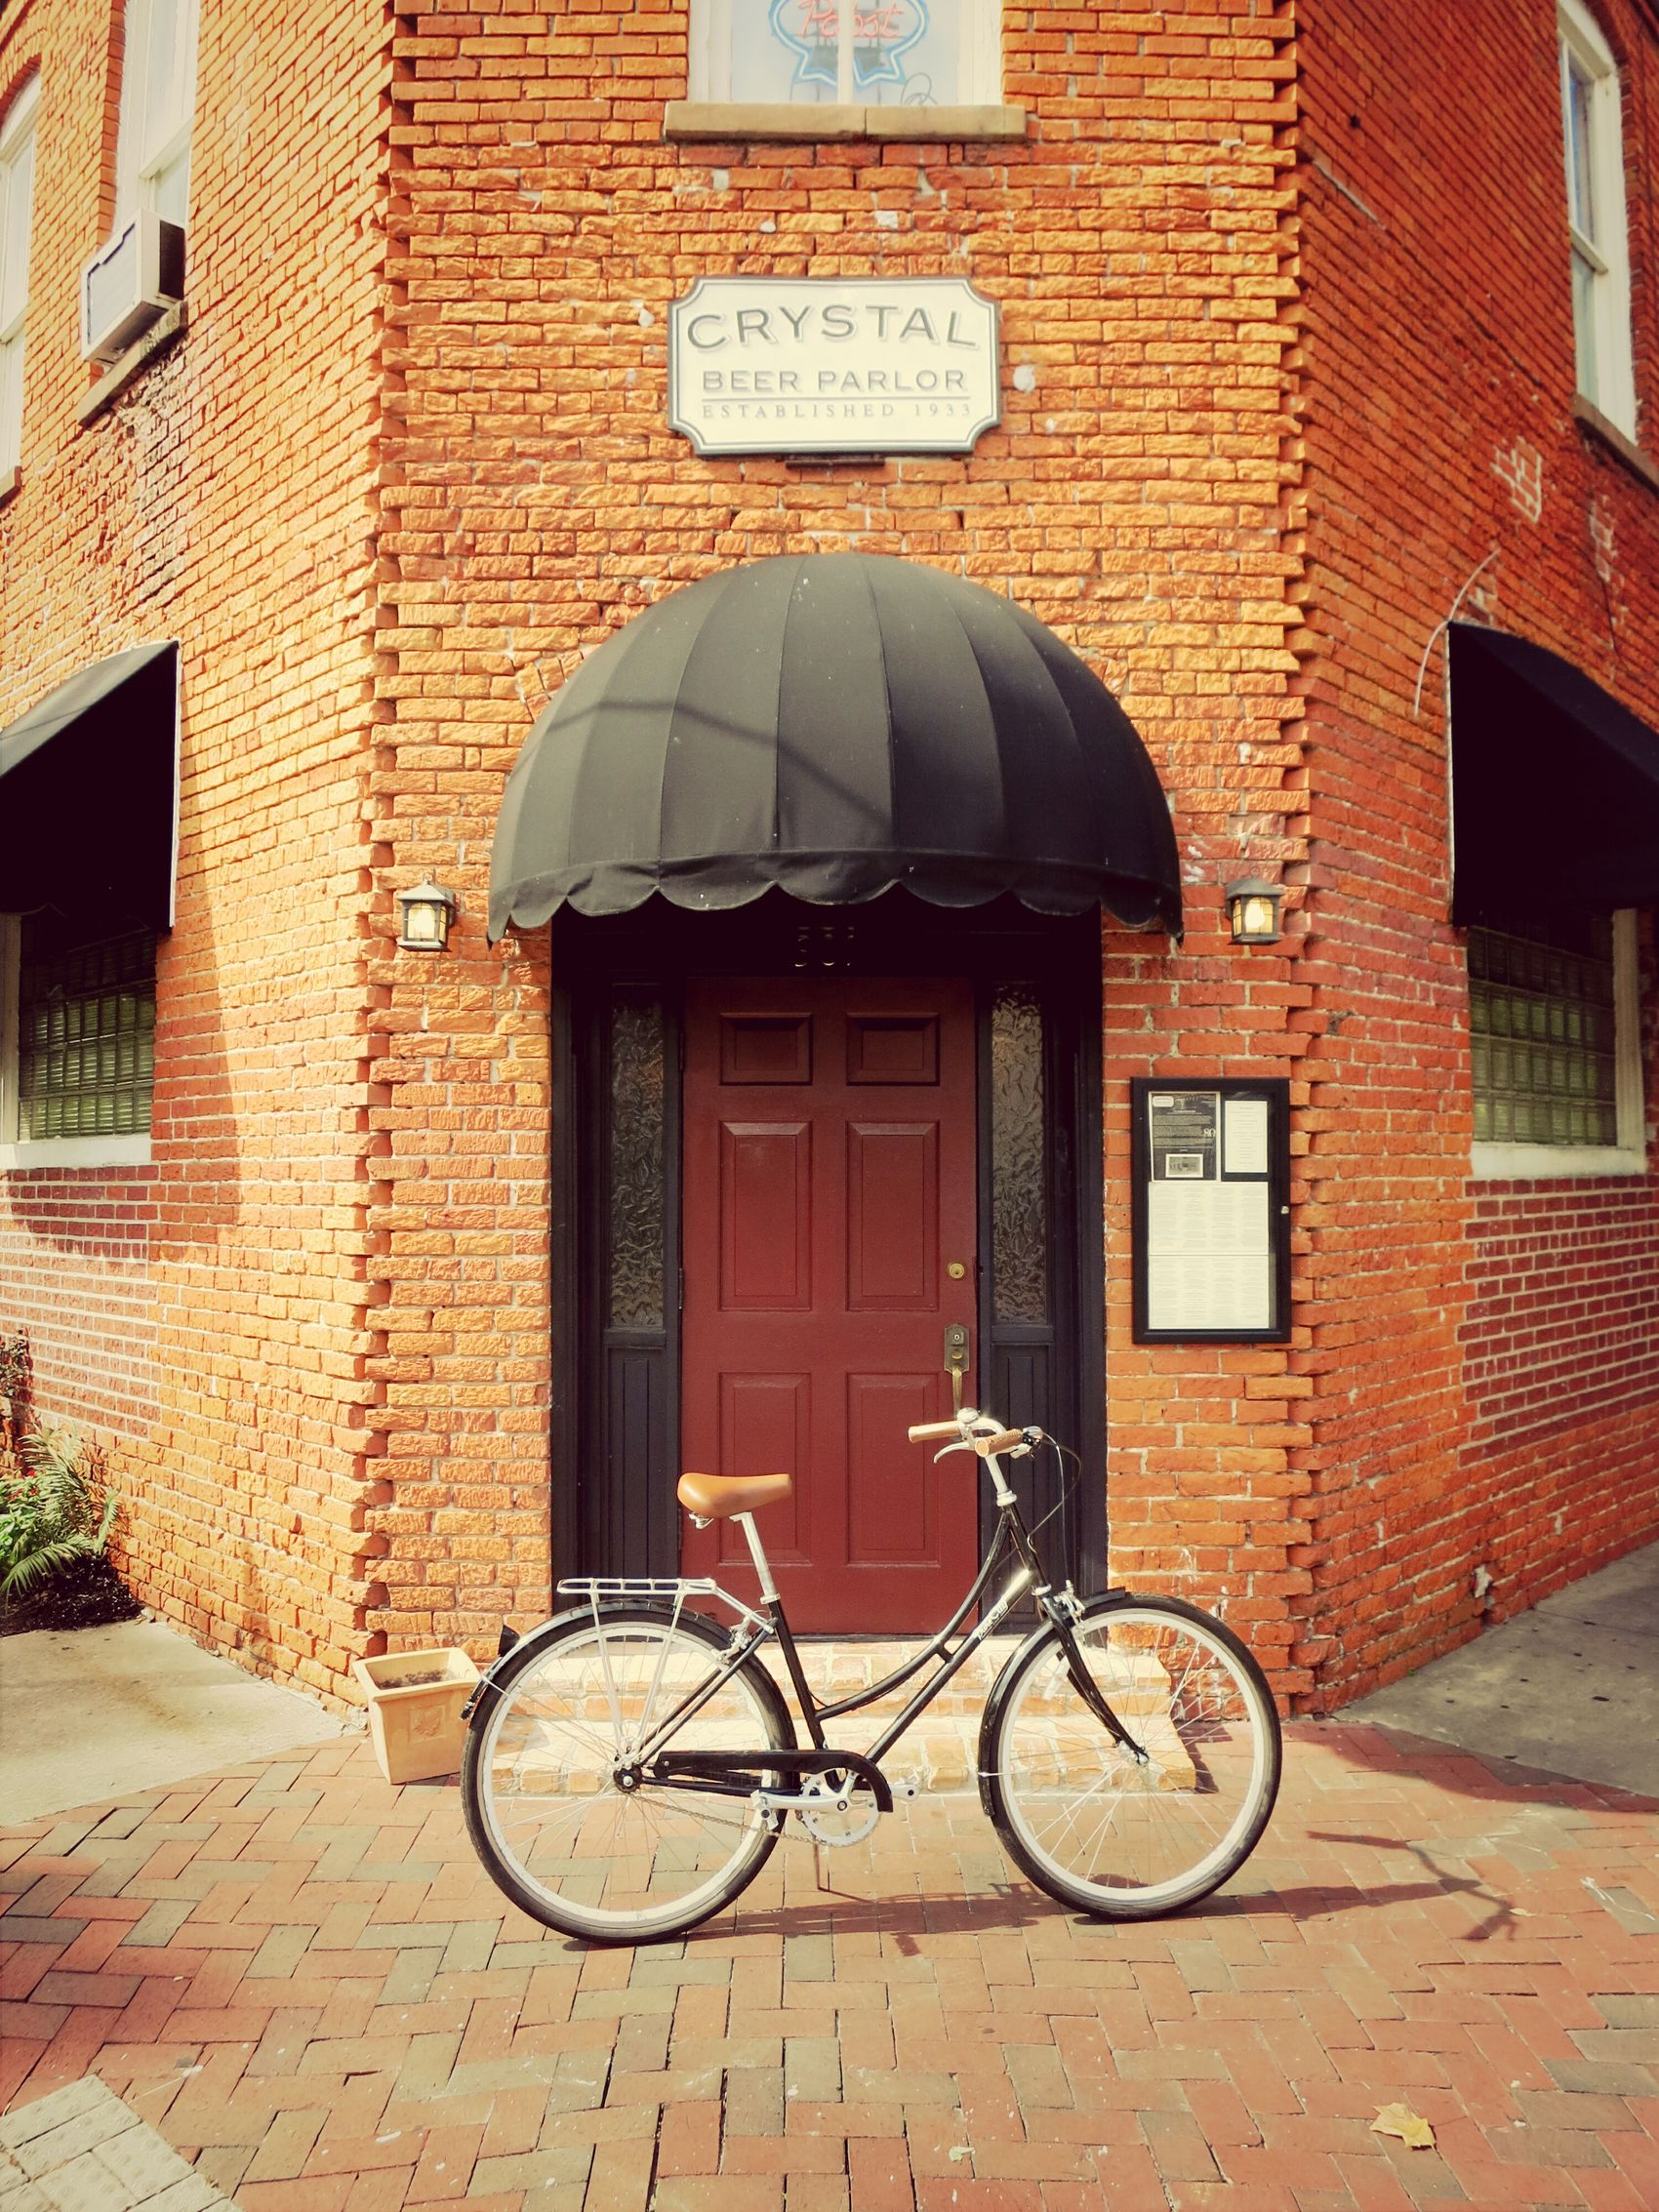 Rent Bikes, Not Cars Purecity Savannah Georgia See The City